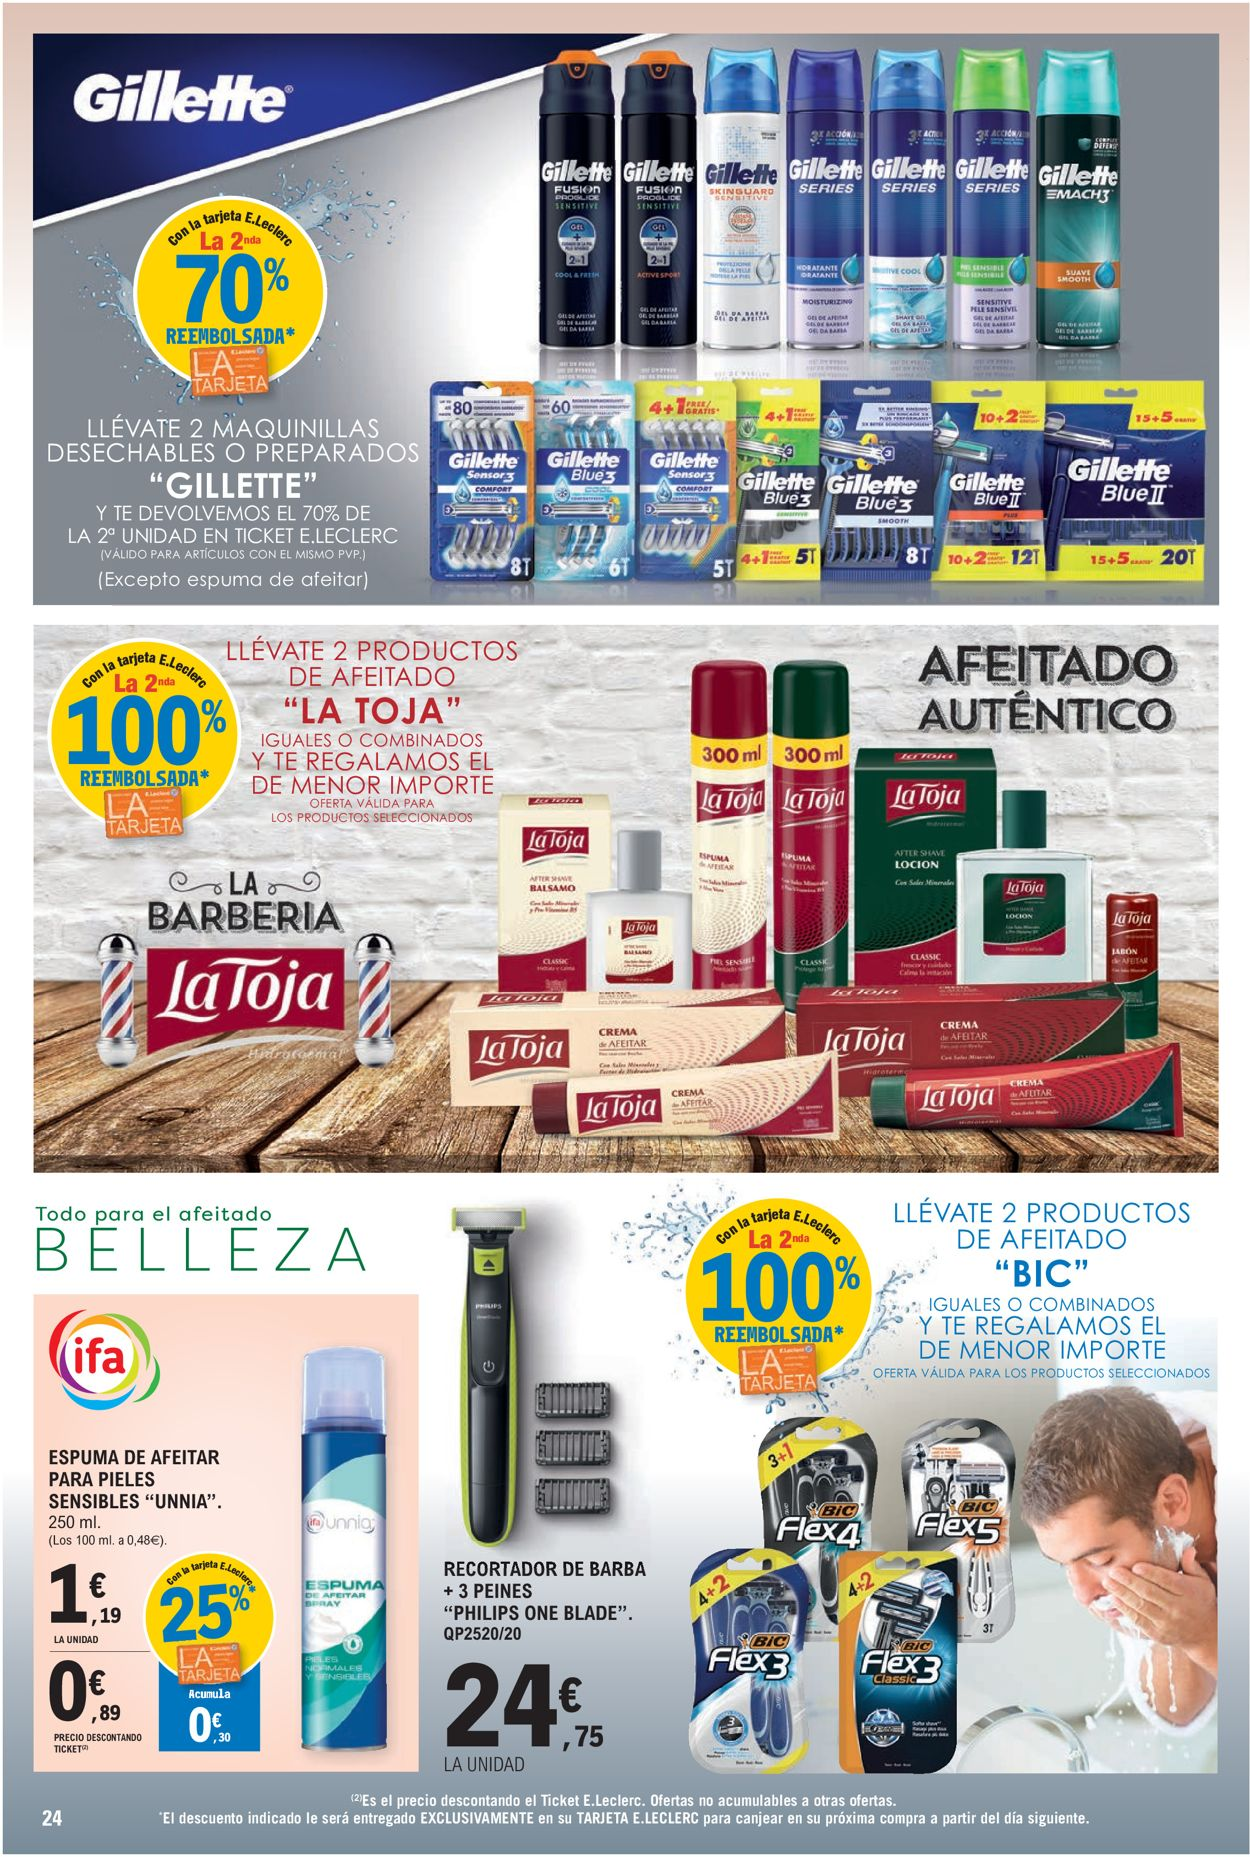 E.leclerc Folleto - 26.05-06.06.2021 (Página 24)